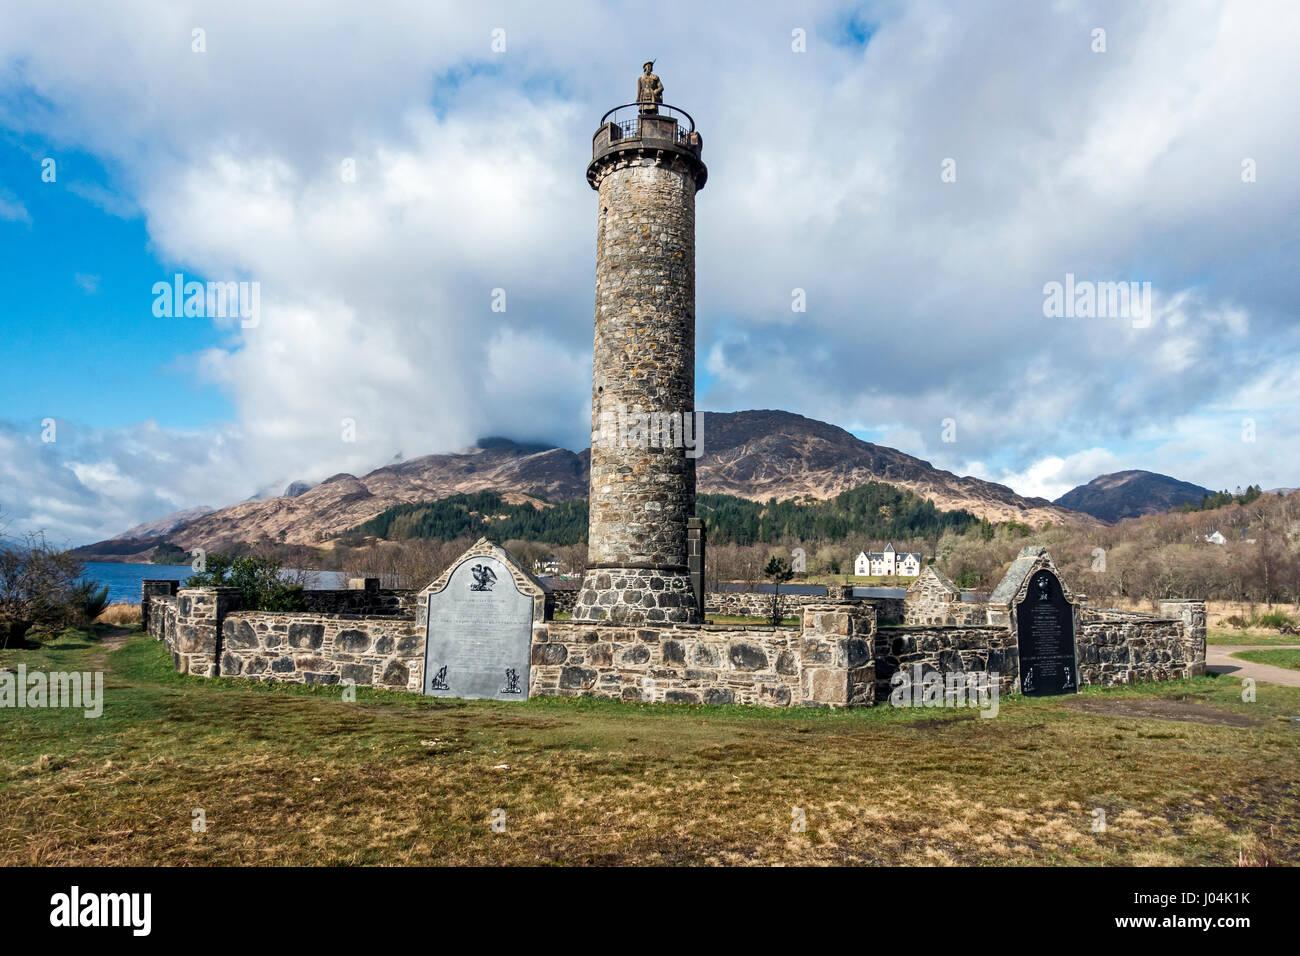 Refurbished Prince Charles Edward Monument at Glenfinnan Highland Scotland - Stock Image